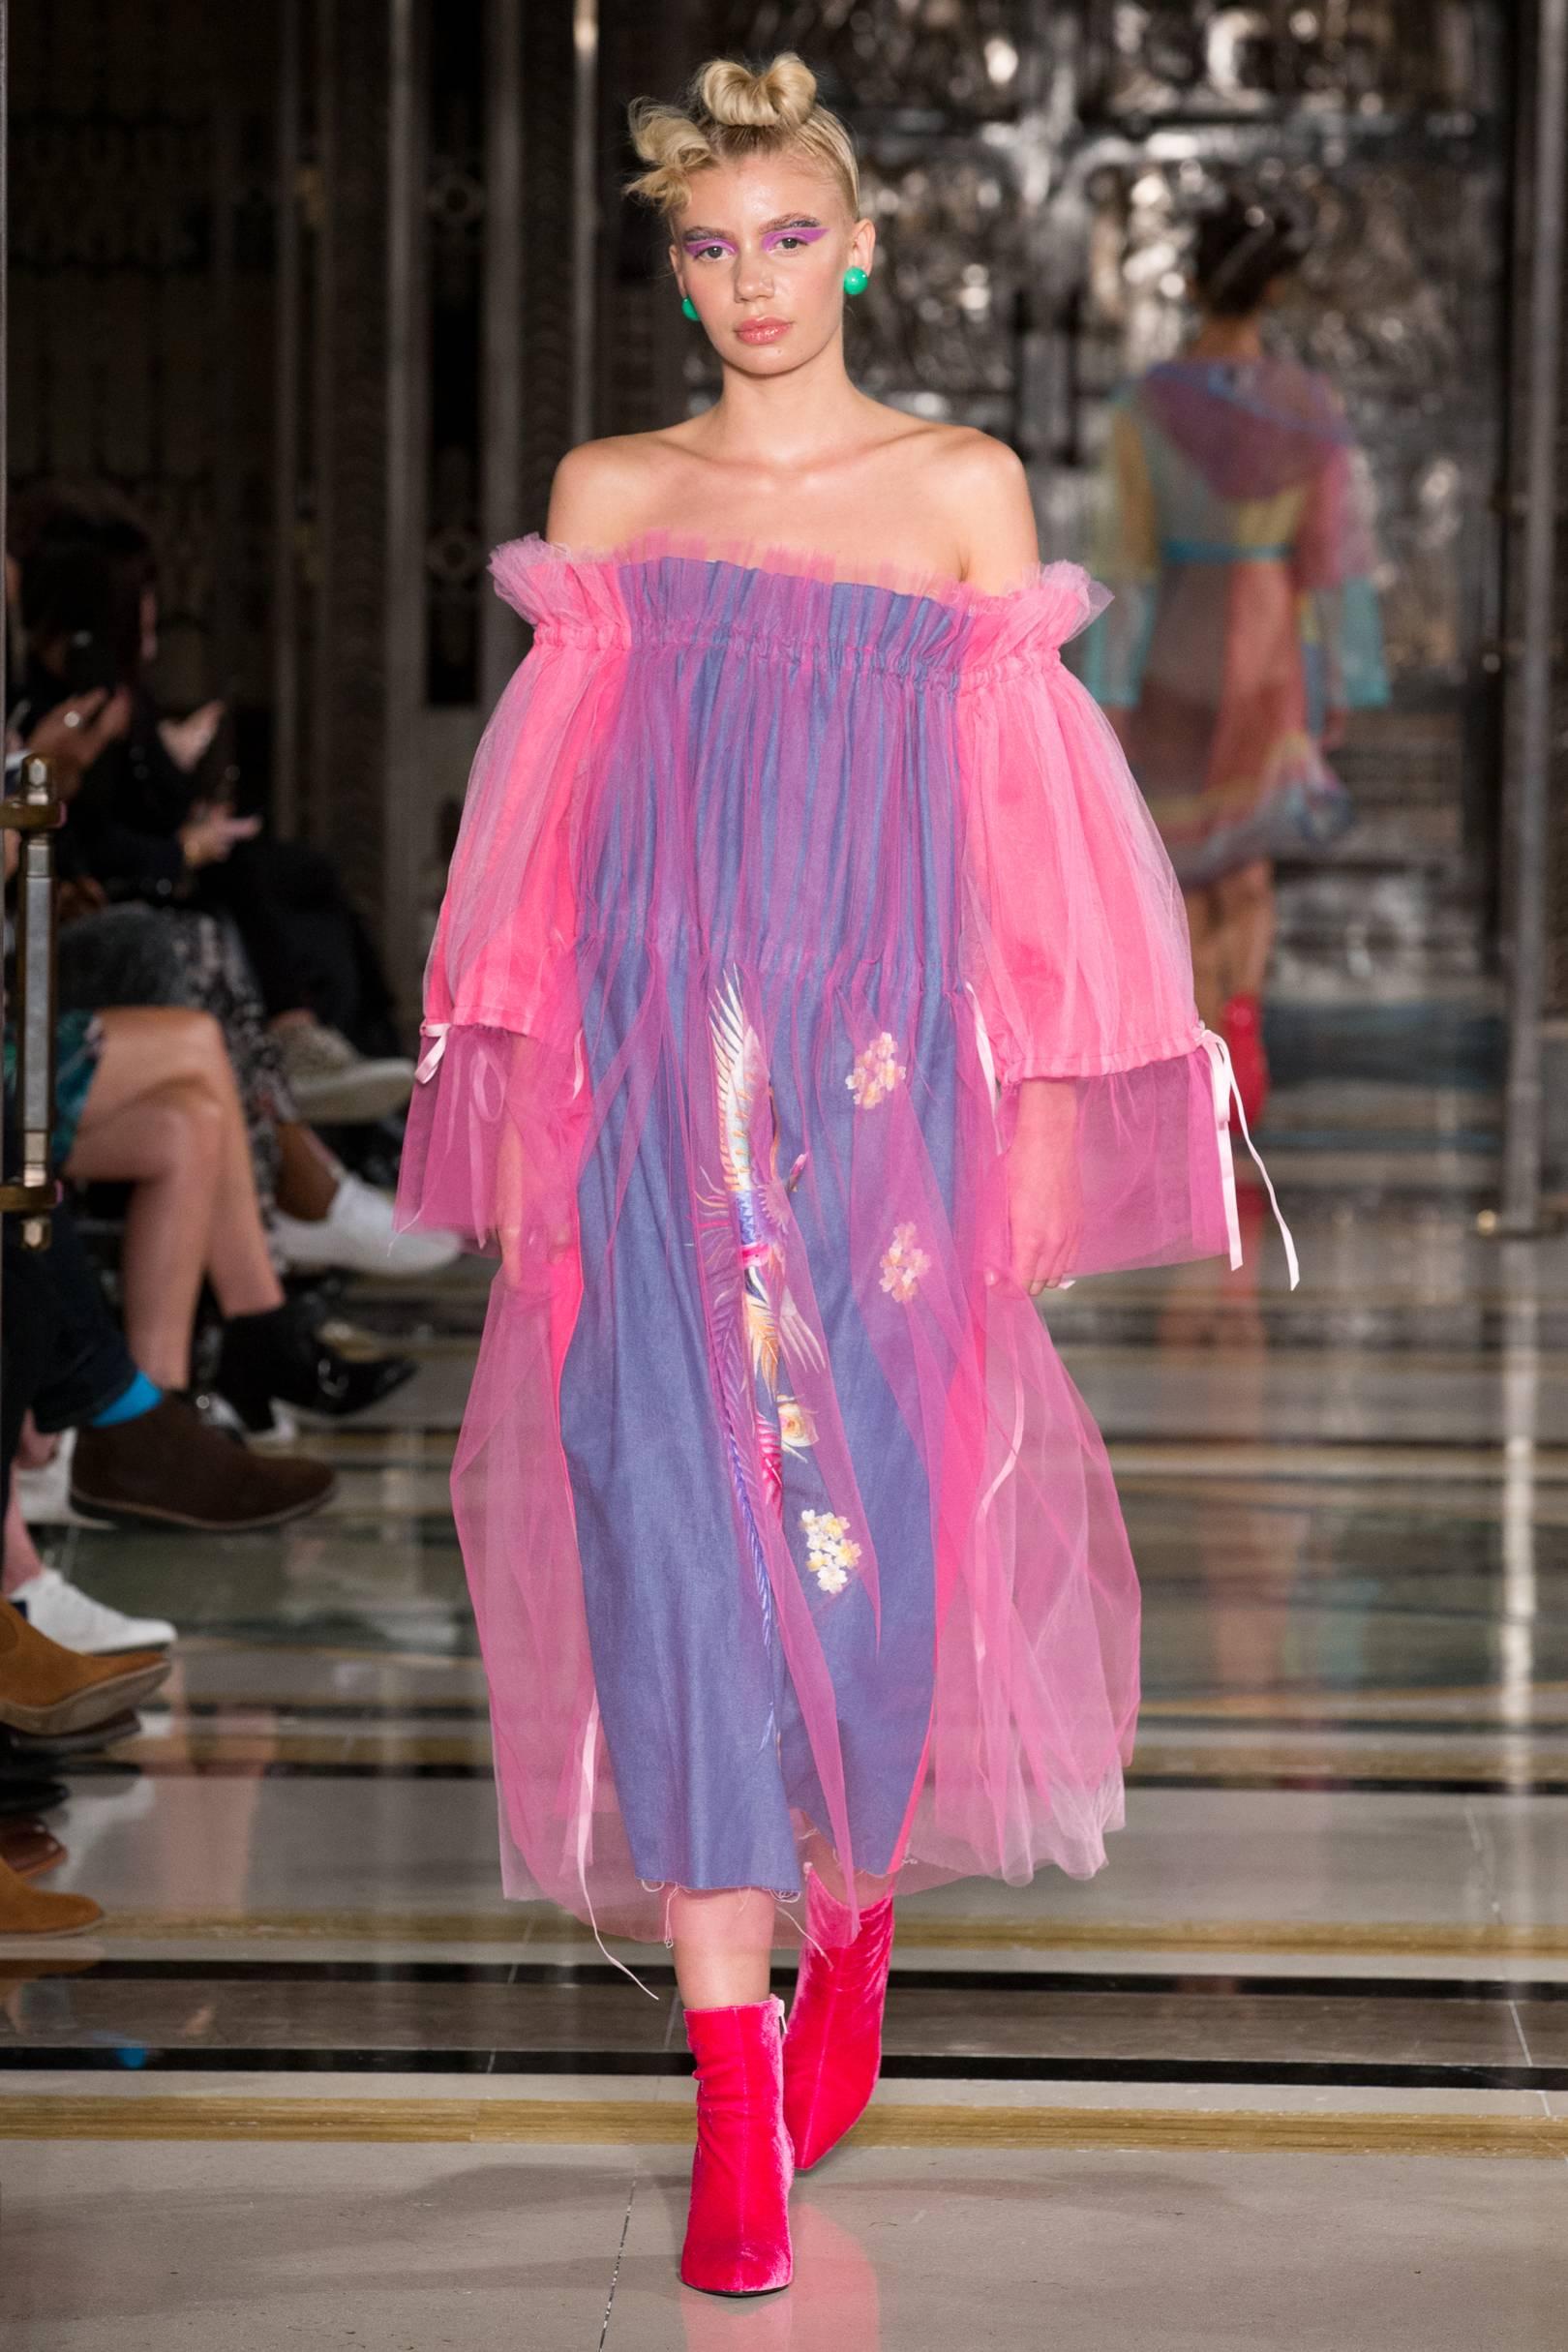 Lujoso Pippa Middleton Réplica De Vestido De Novia Fotos - Vestido ...